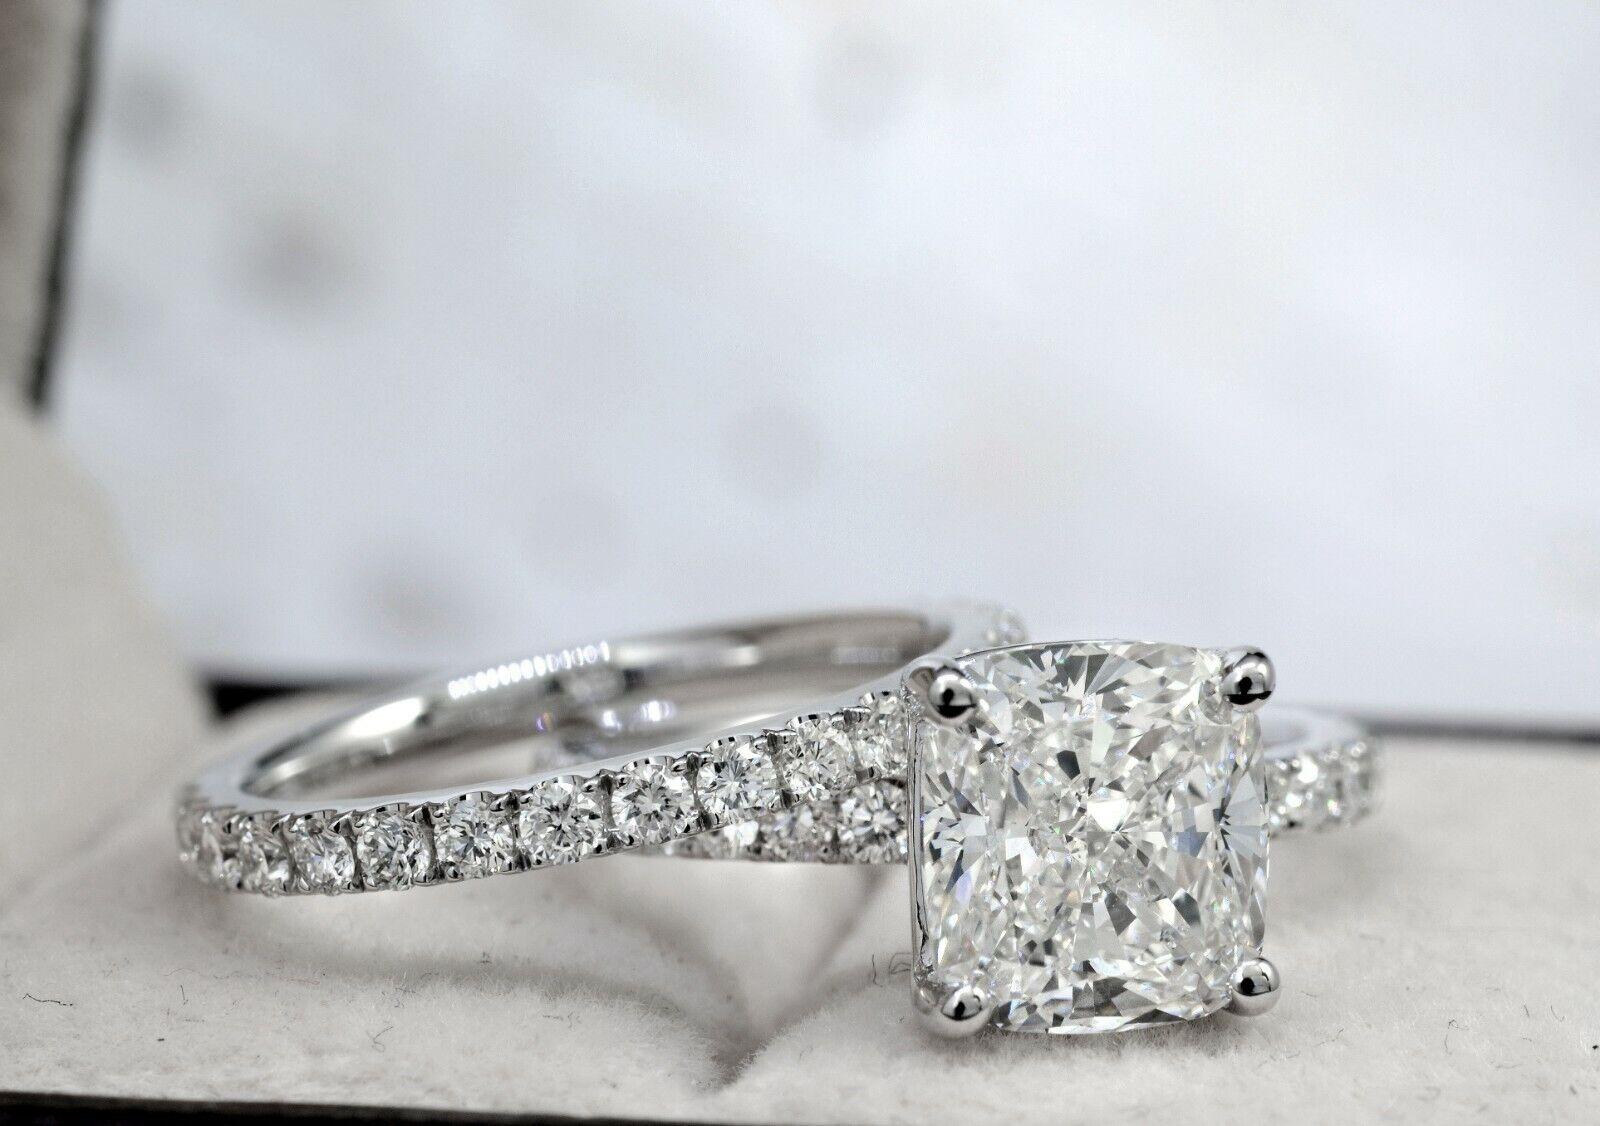 Dazzling 2.10 Ct. Cushion Cut Diamond Engagement Ring Bridal Set GIA Certified 5